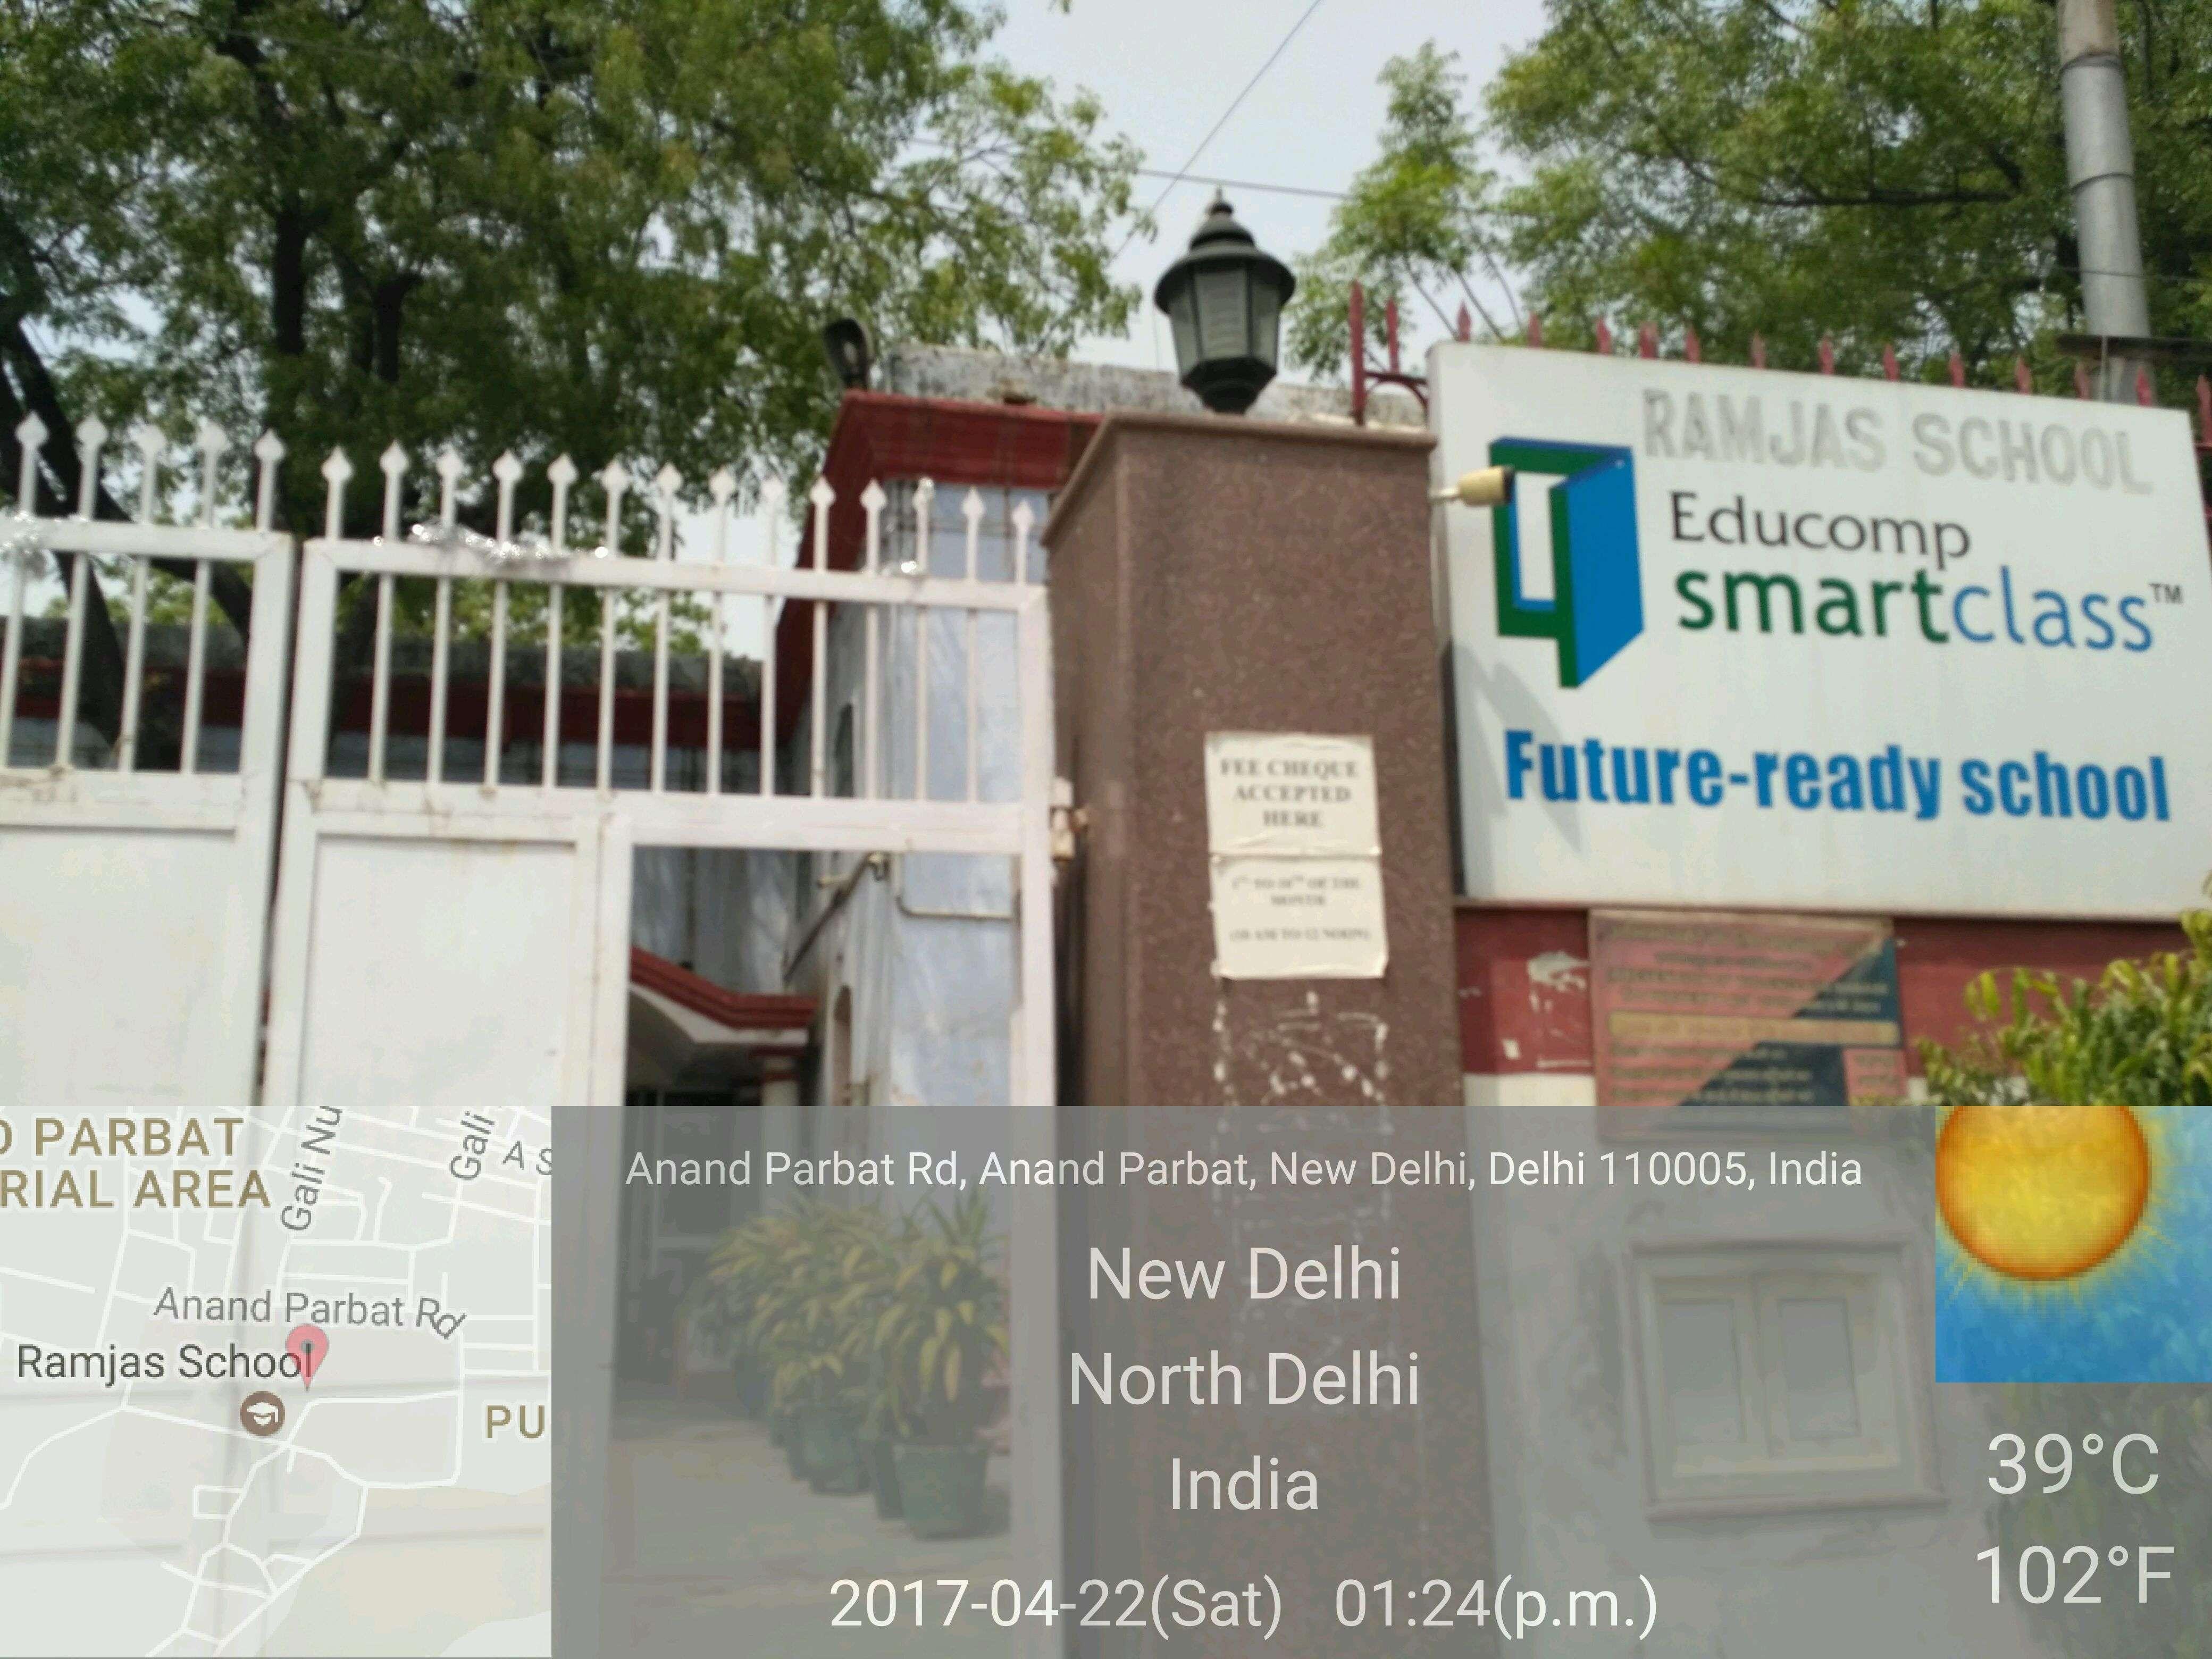 RAMJAS SCHOOL ANAND PARBAT NEW DELHI 2730161